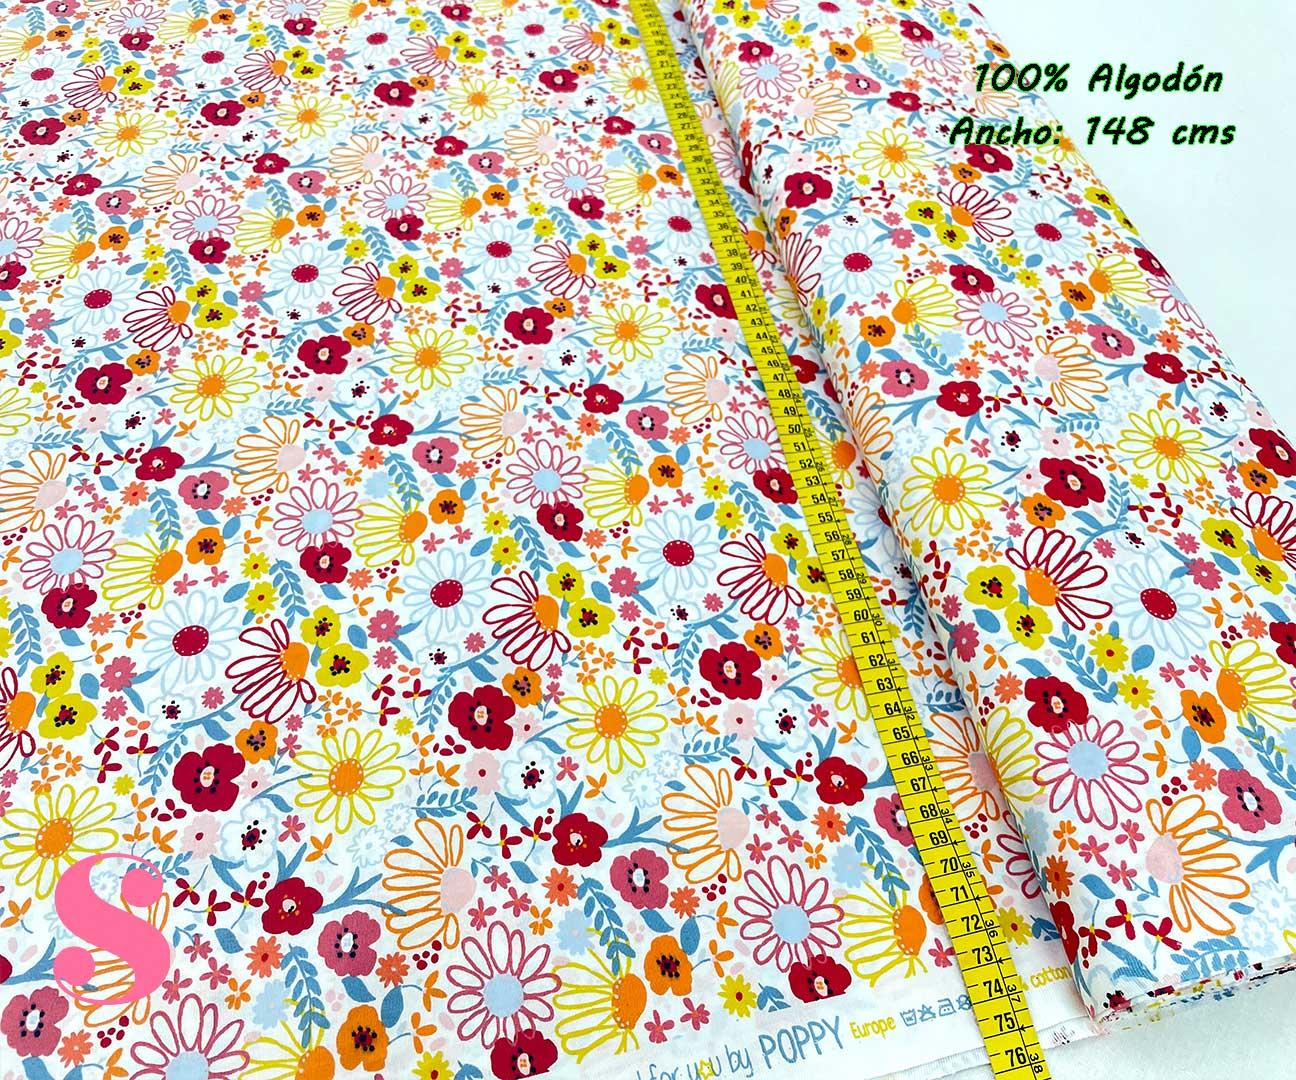 56-tela-estampada-flores,telas-dibujos-primaverales,telas-infantiles,tejidos-infantiles,Tejido Estampado Mix Flowers